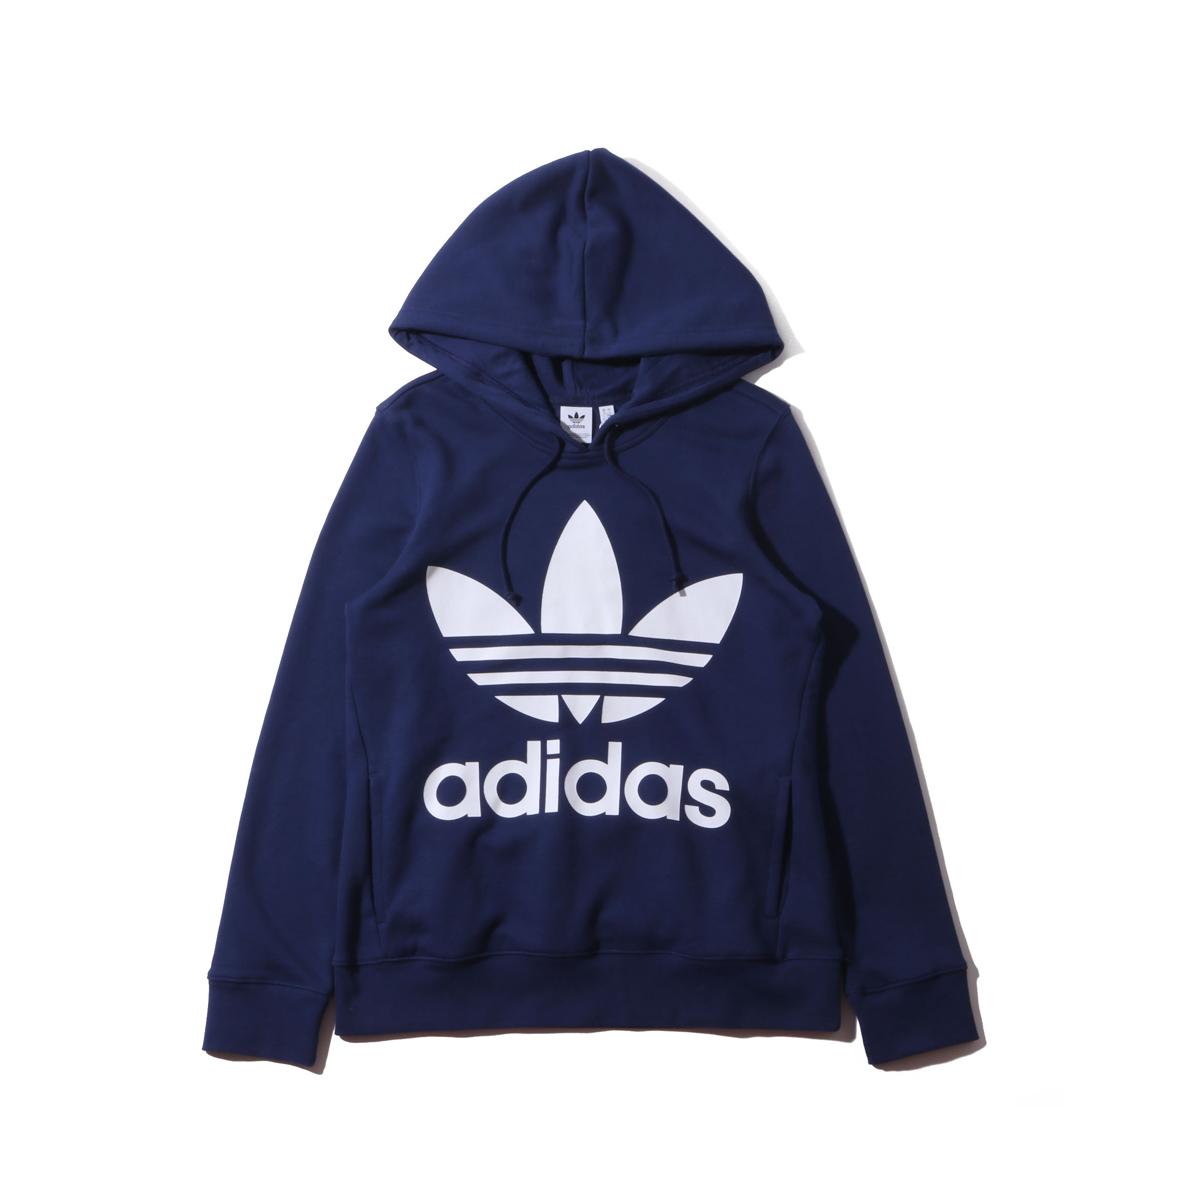 adidas Originals TREFOIL HOODIE(アディダスオリジナルス トレフォイル フーディー)DARK BLUE【レディース パーカー】19SS-I